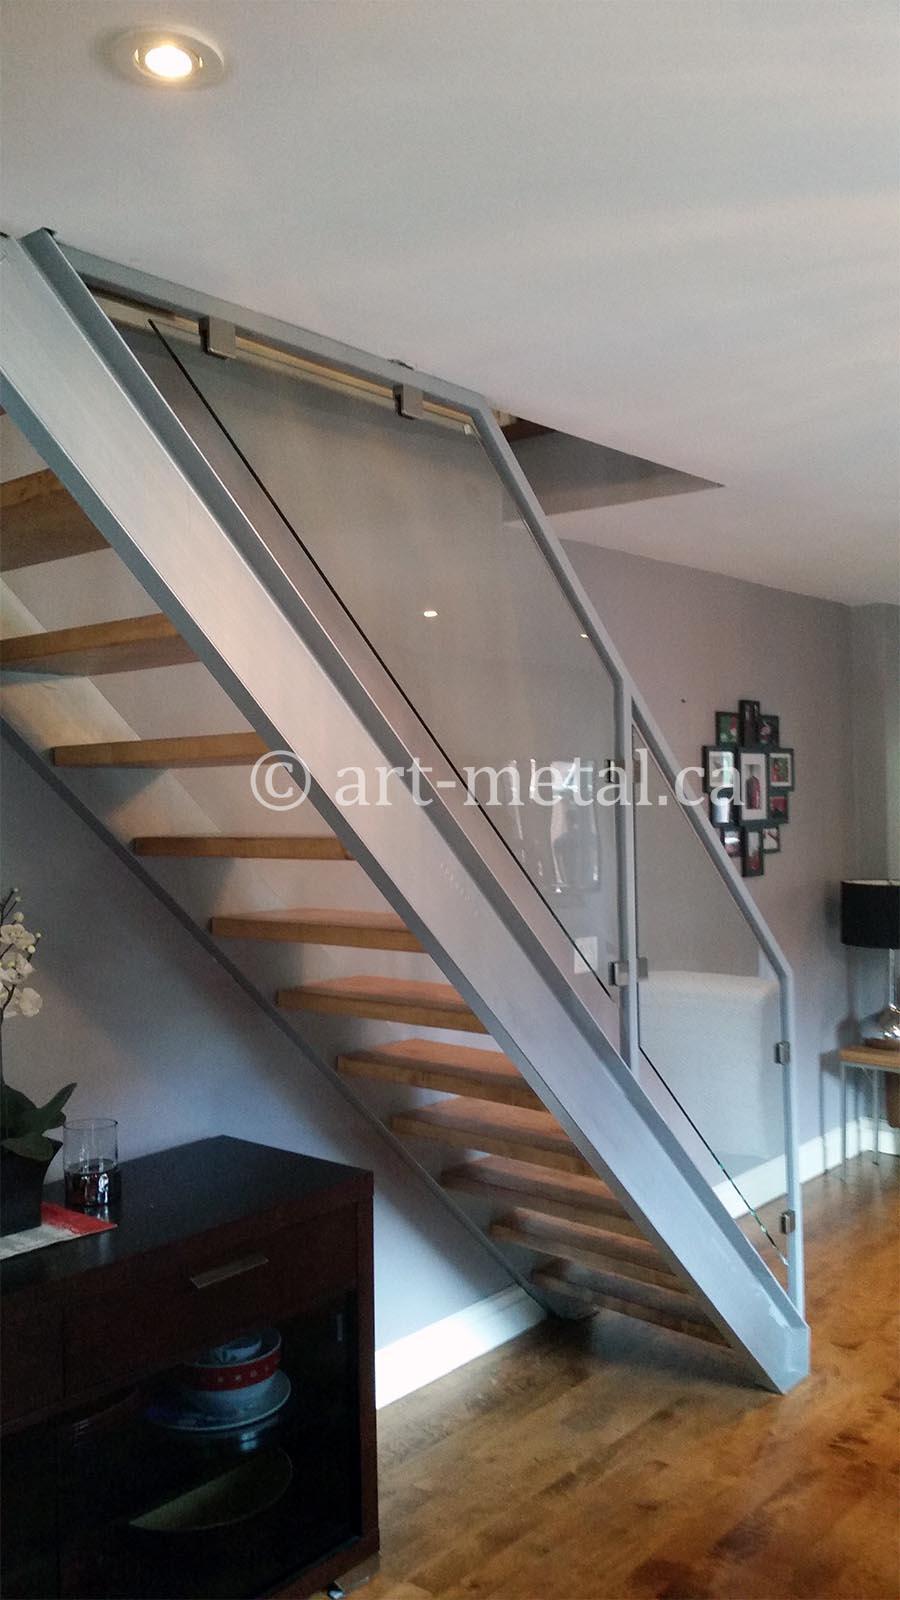 glass balustrade installation instructions